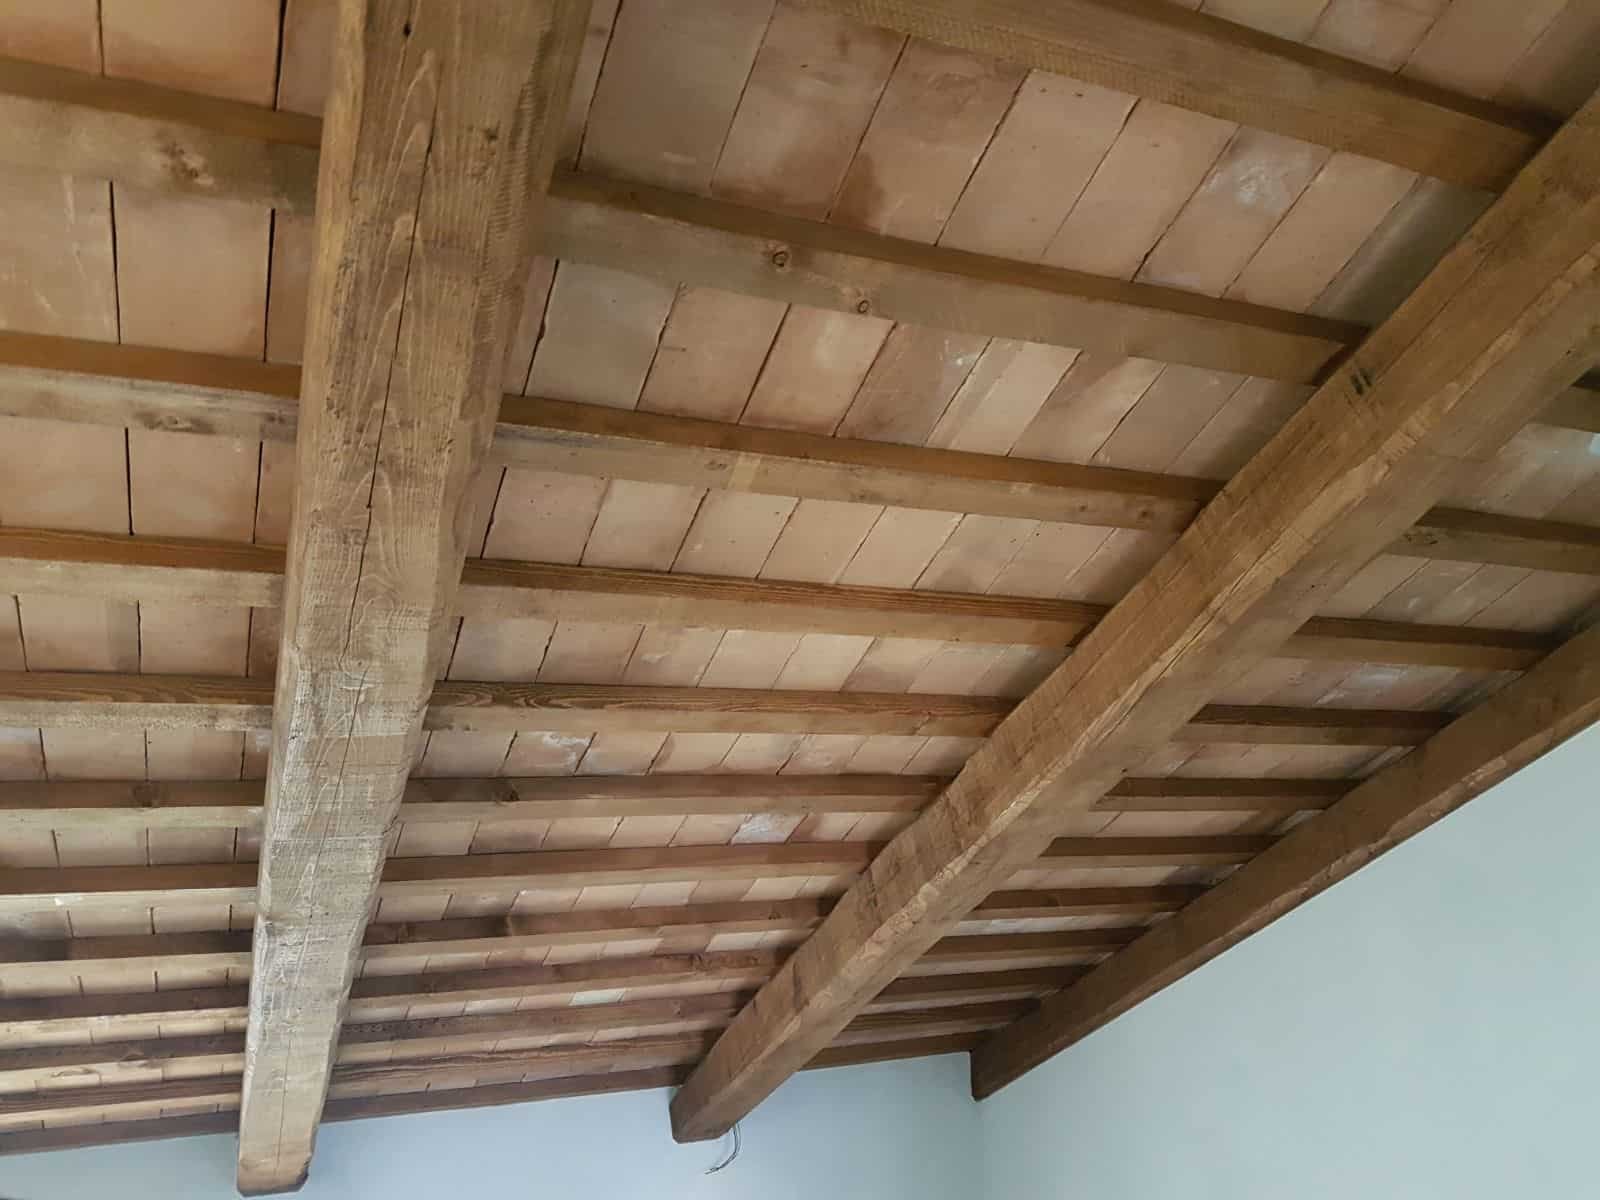 Top Floor Ceiling Closeup